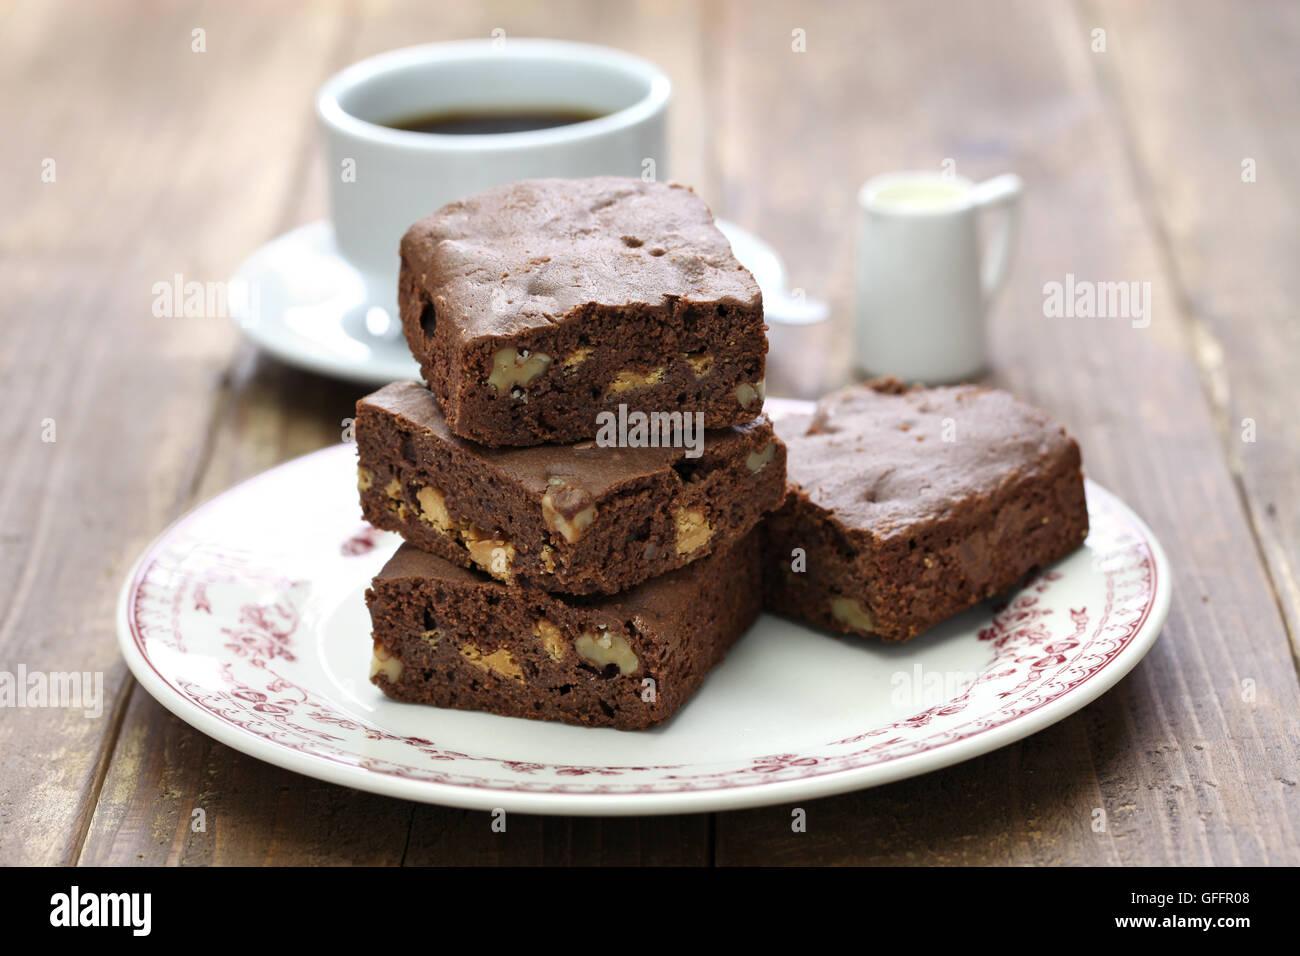 homemade chocolate brownie cake, coffee break - Stock Image